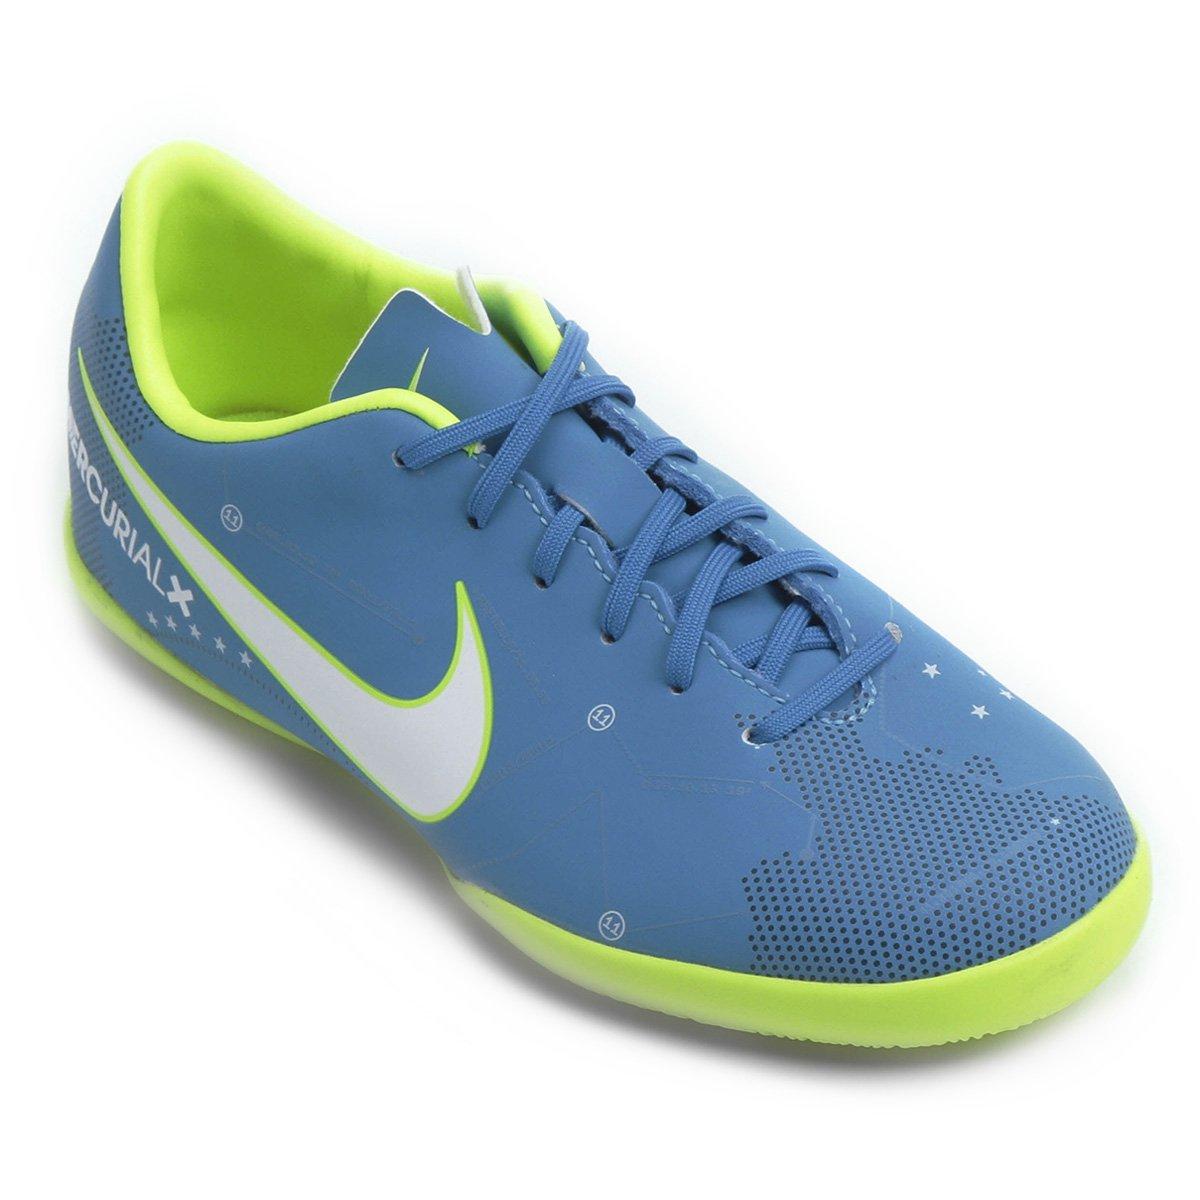 d02e378584 Chuteira Futsal Infantil Nike Mercurial Victory 6 Neymar Jr IC